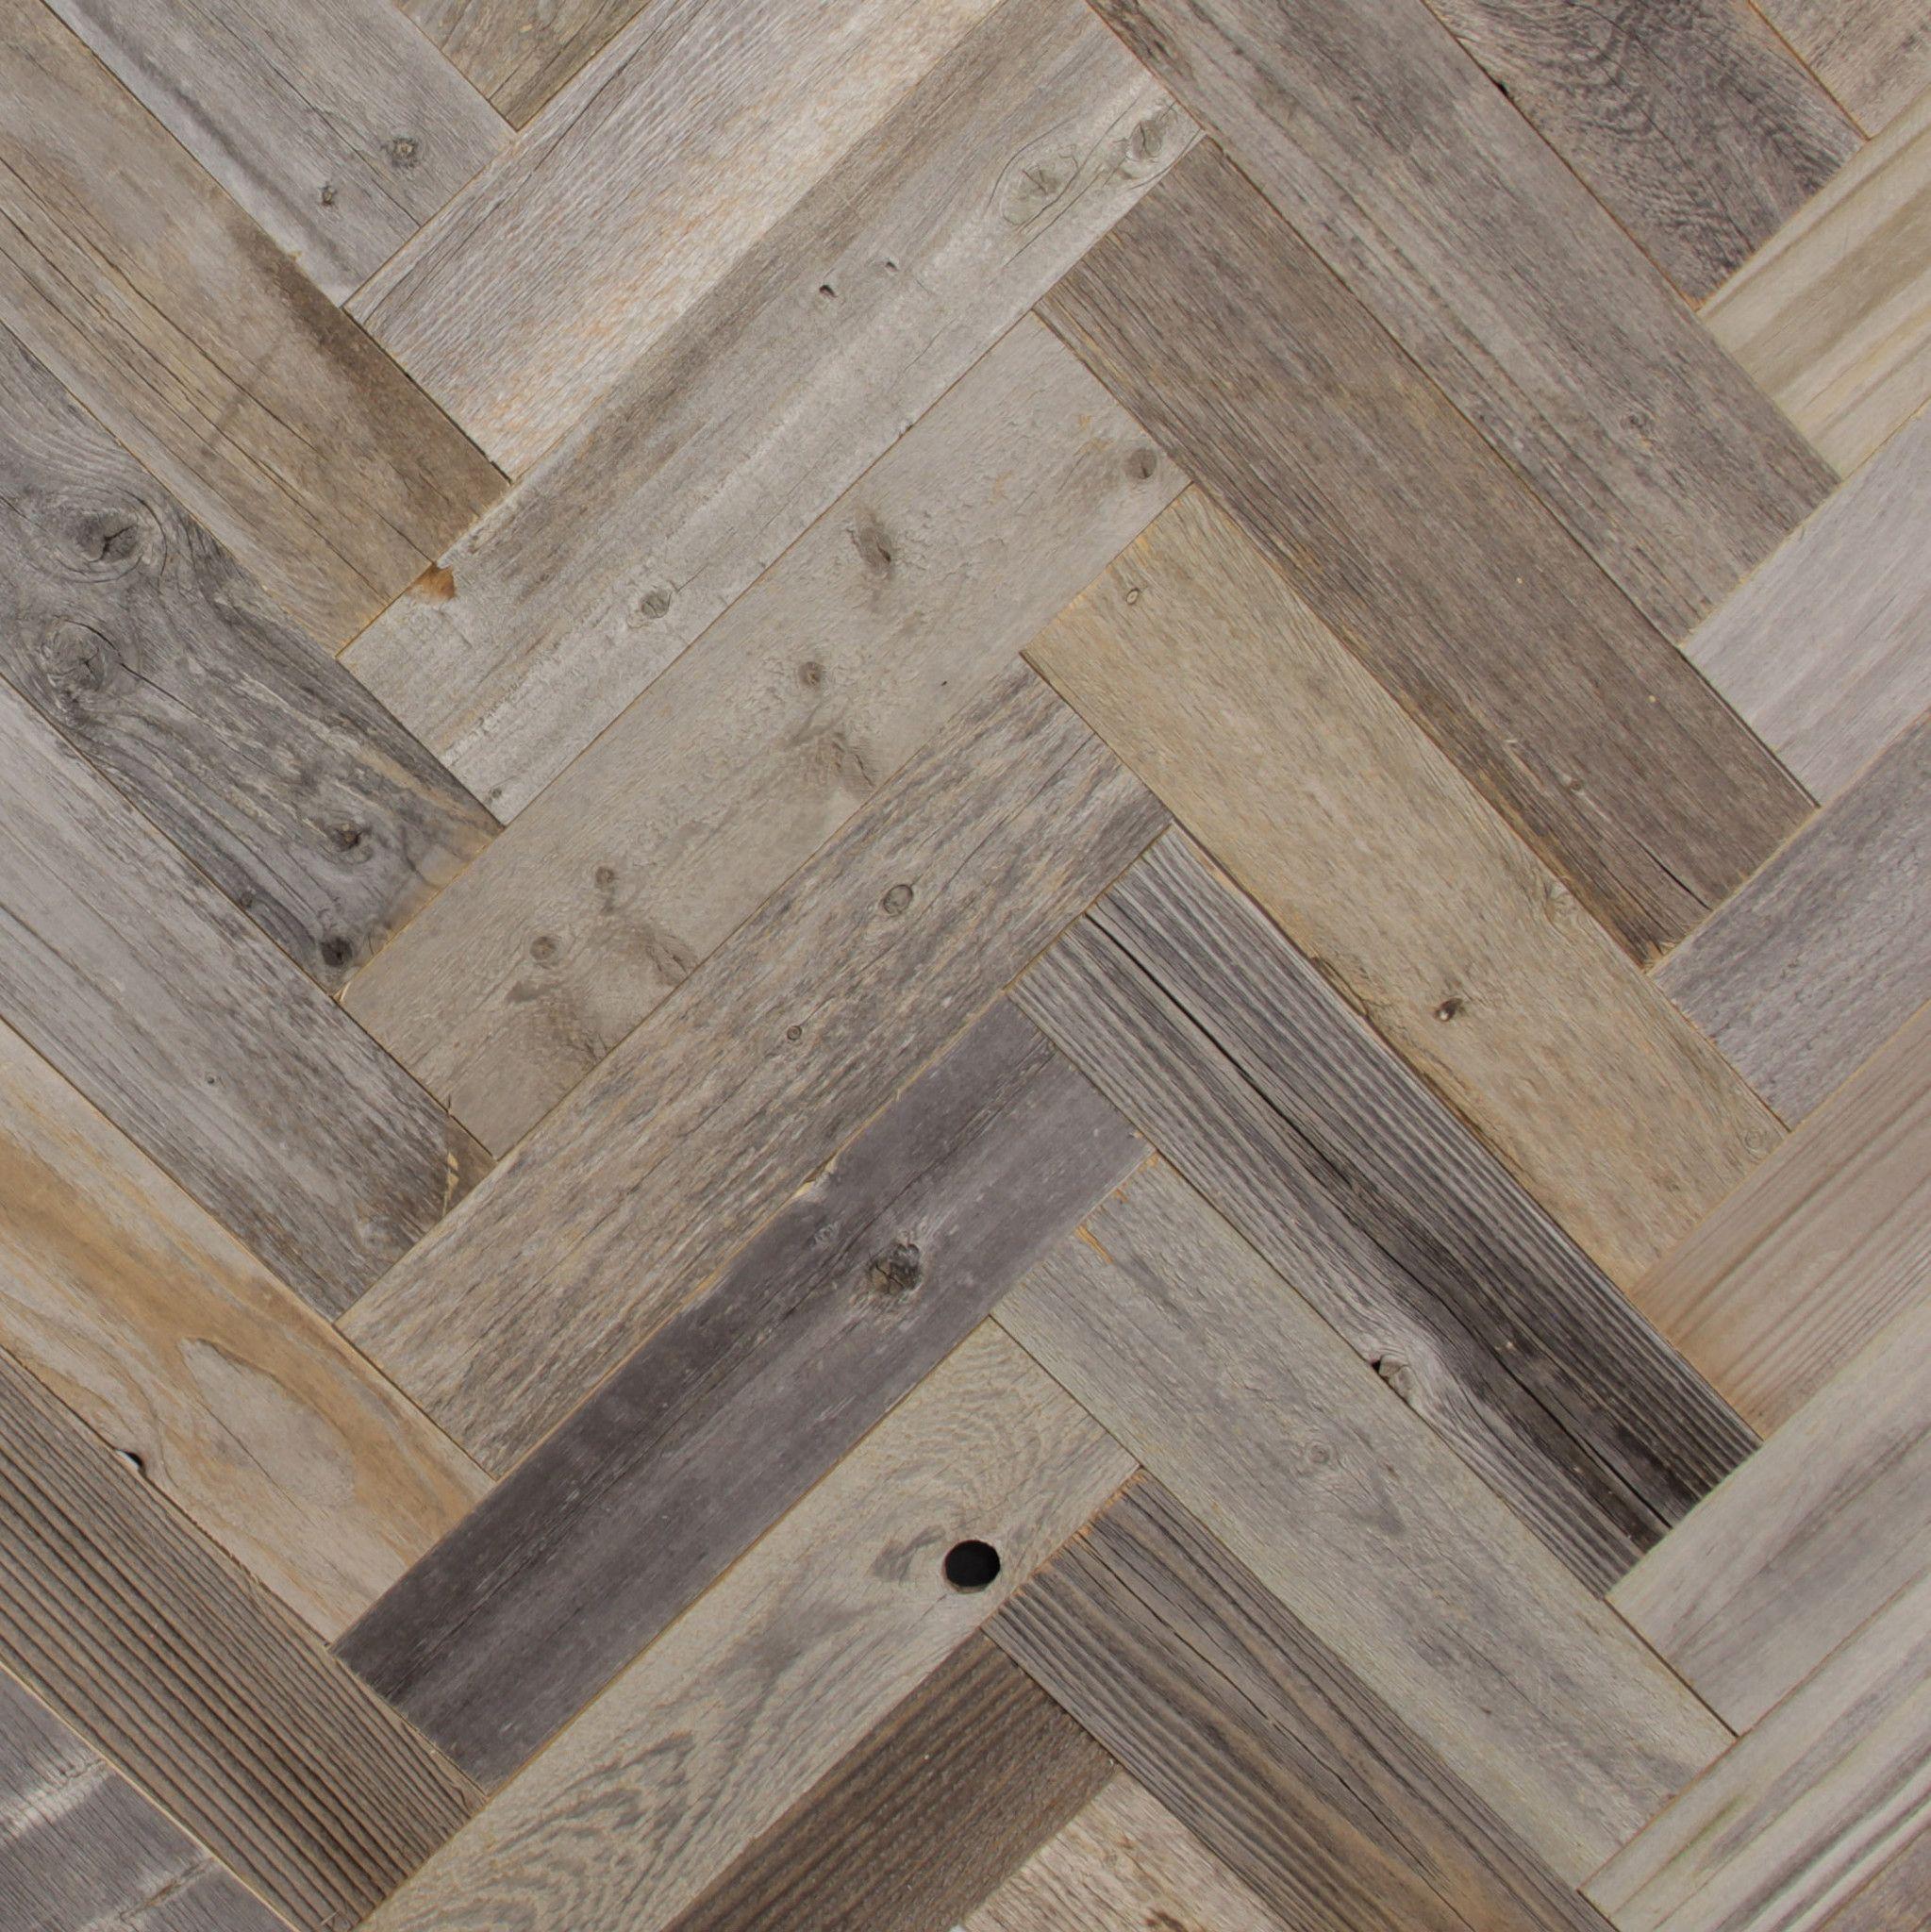 Reclaimed Barn Wood Planks Herringbone Pattern Reclaimed Barn Wood Reclaimed Barn Wood Wall Herringbone Wood